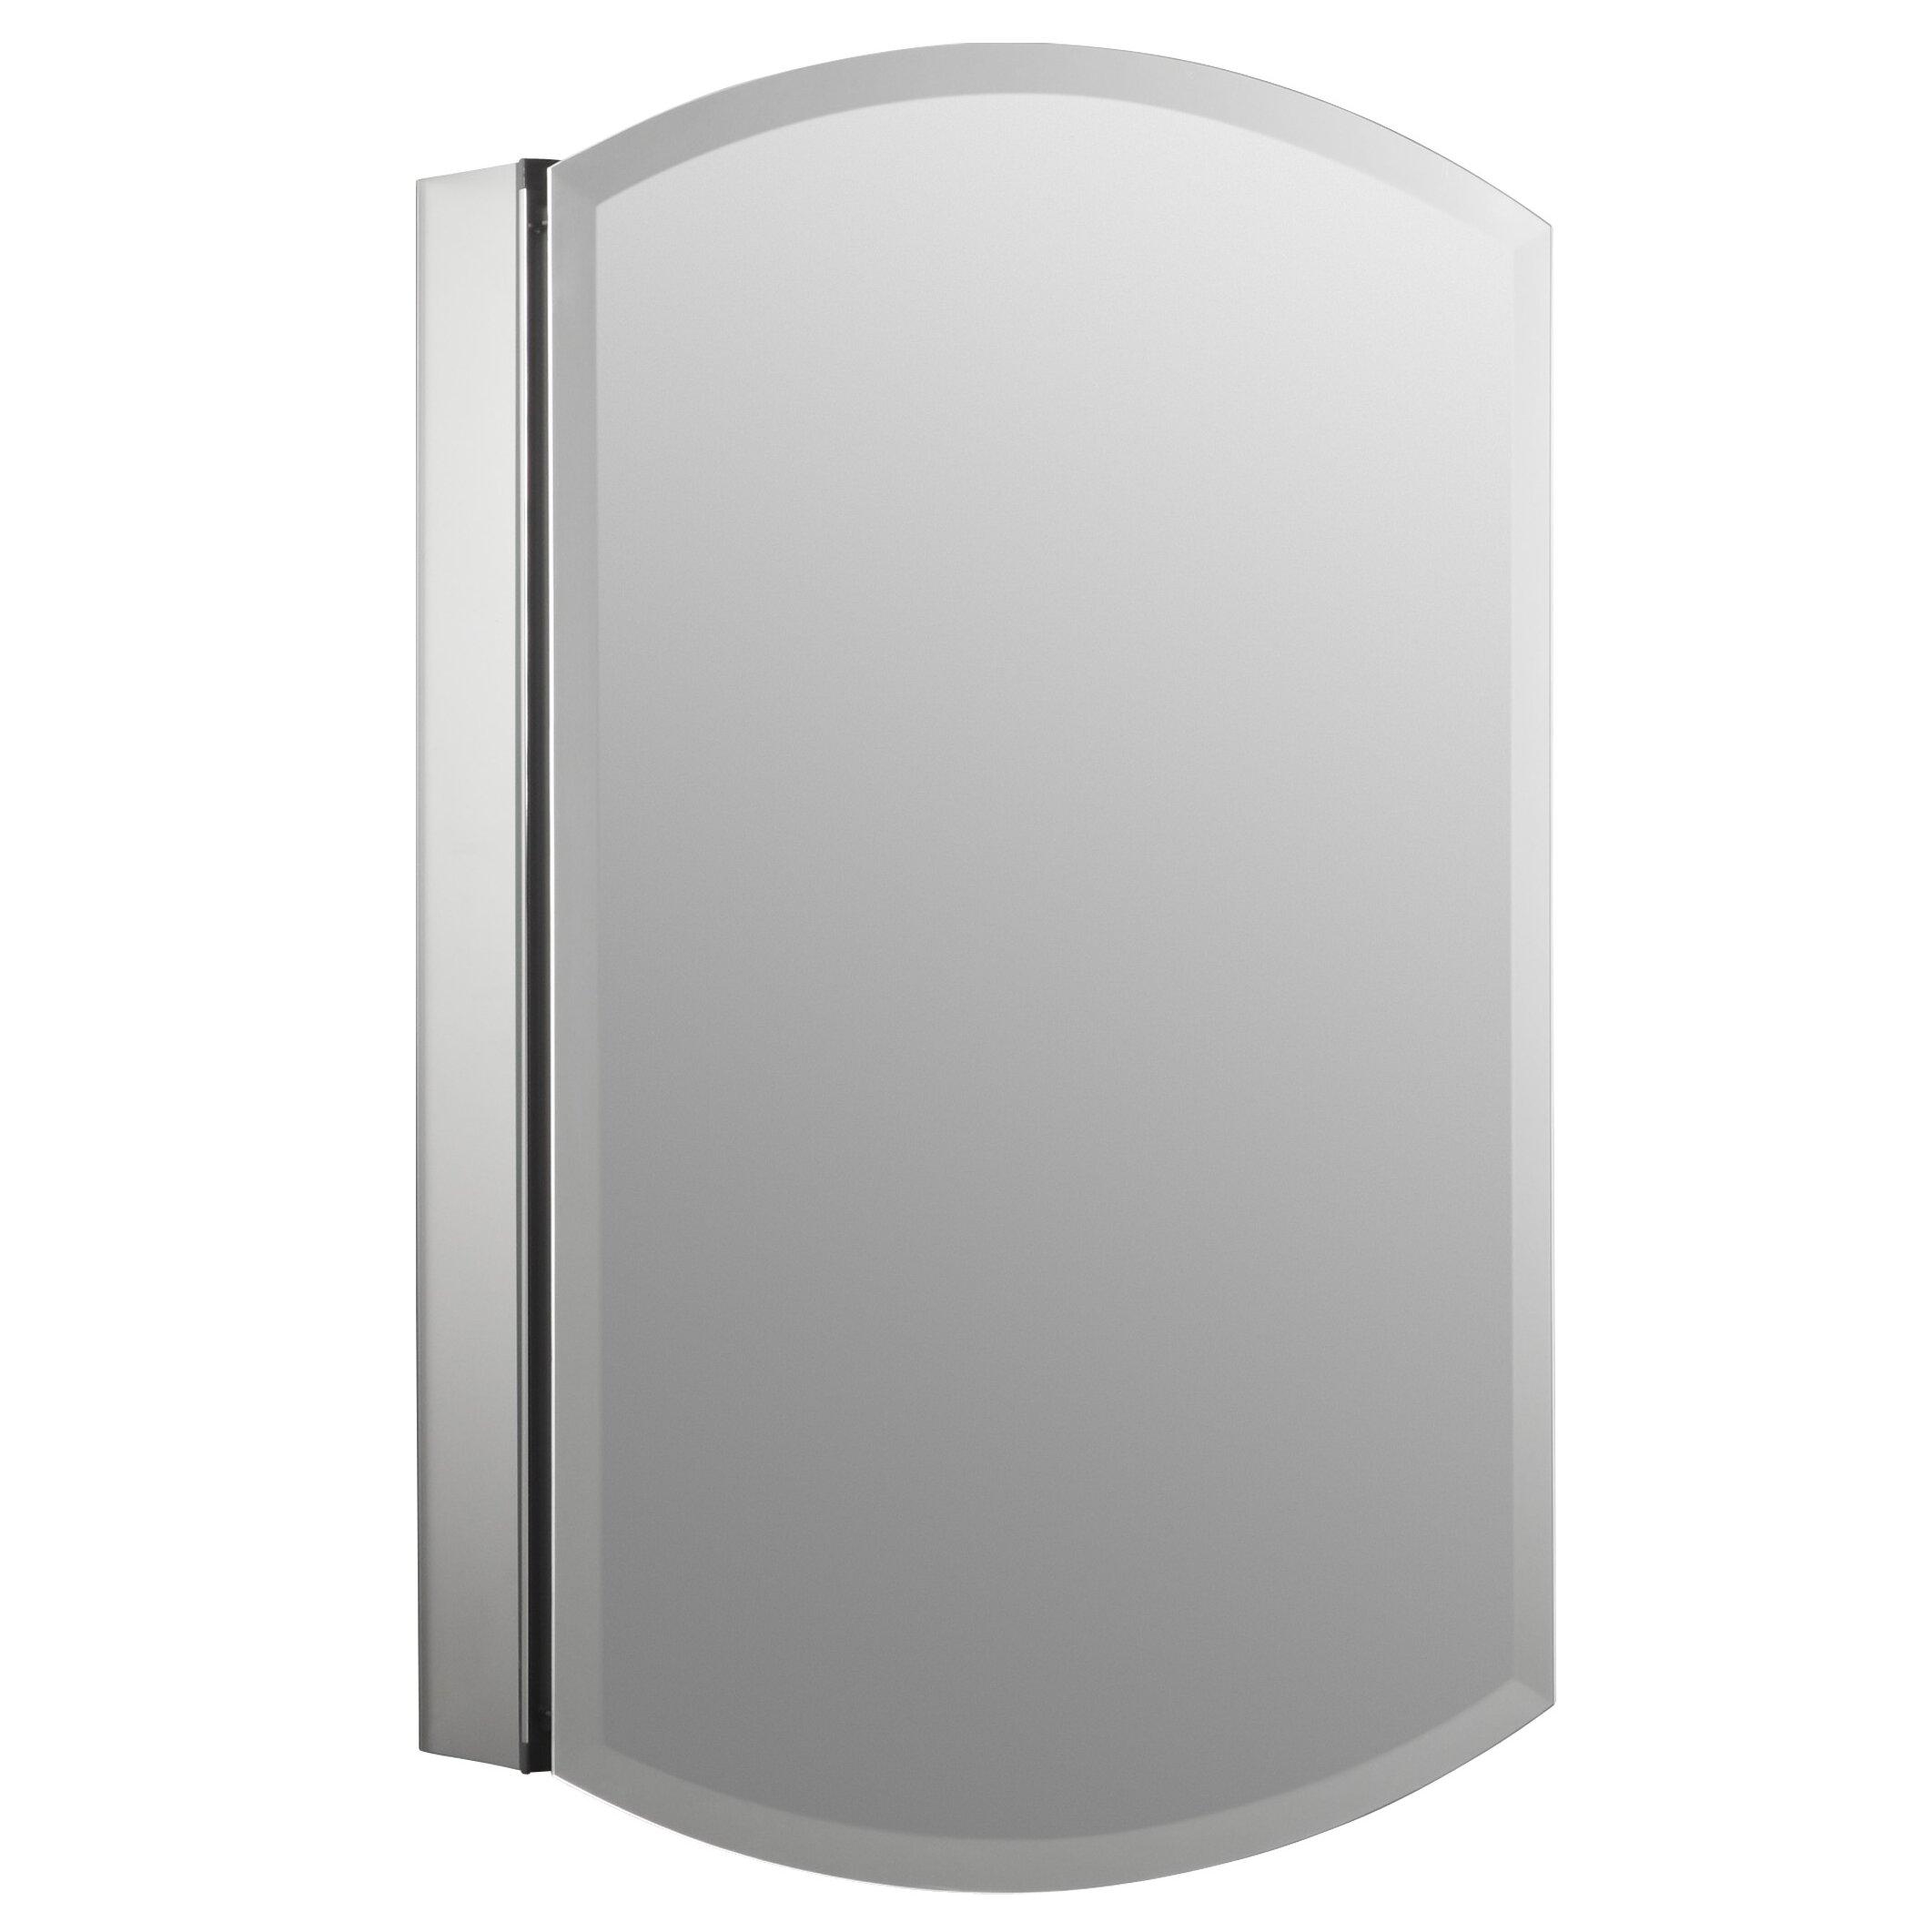 kohler archer 20 x 31 aluminum wall mount medicine cabinet with mirrored door reviews wayfair. Black Bedroom Furniture Sets. Home Design Ideas